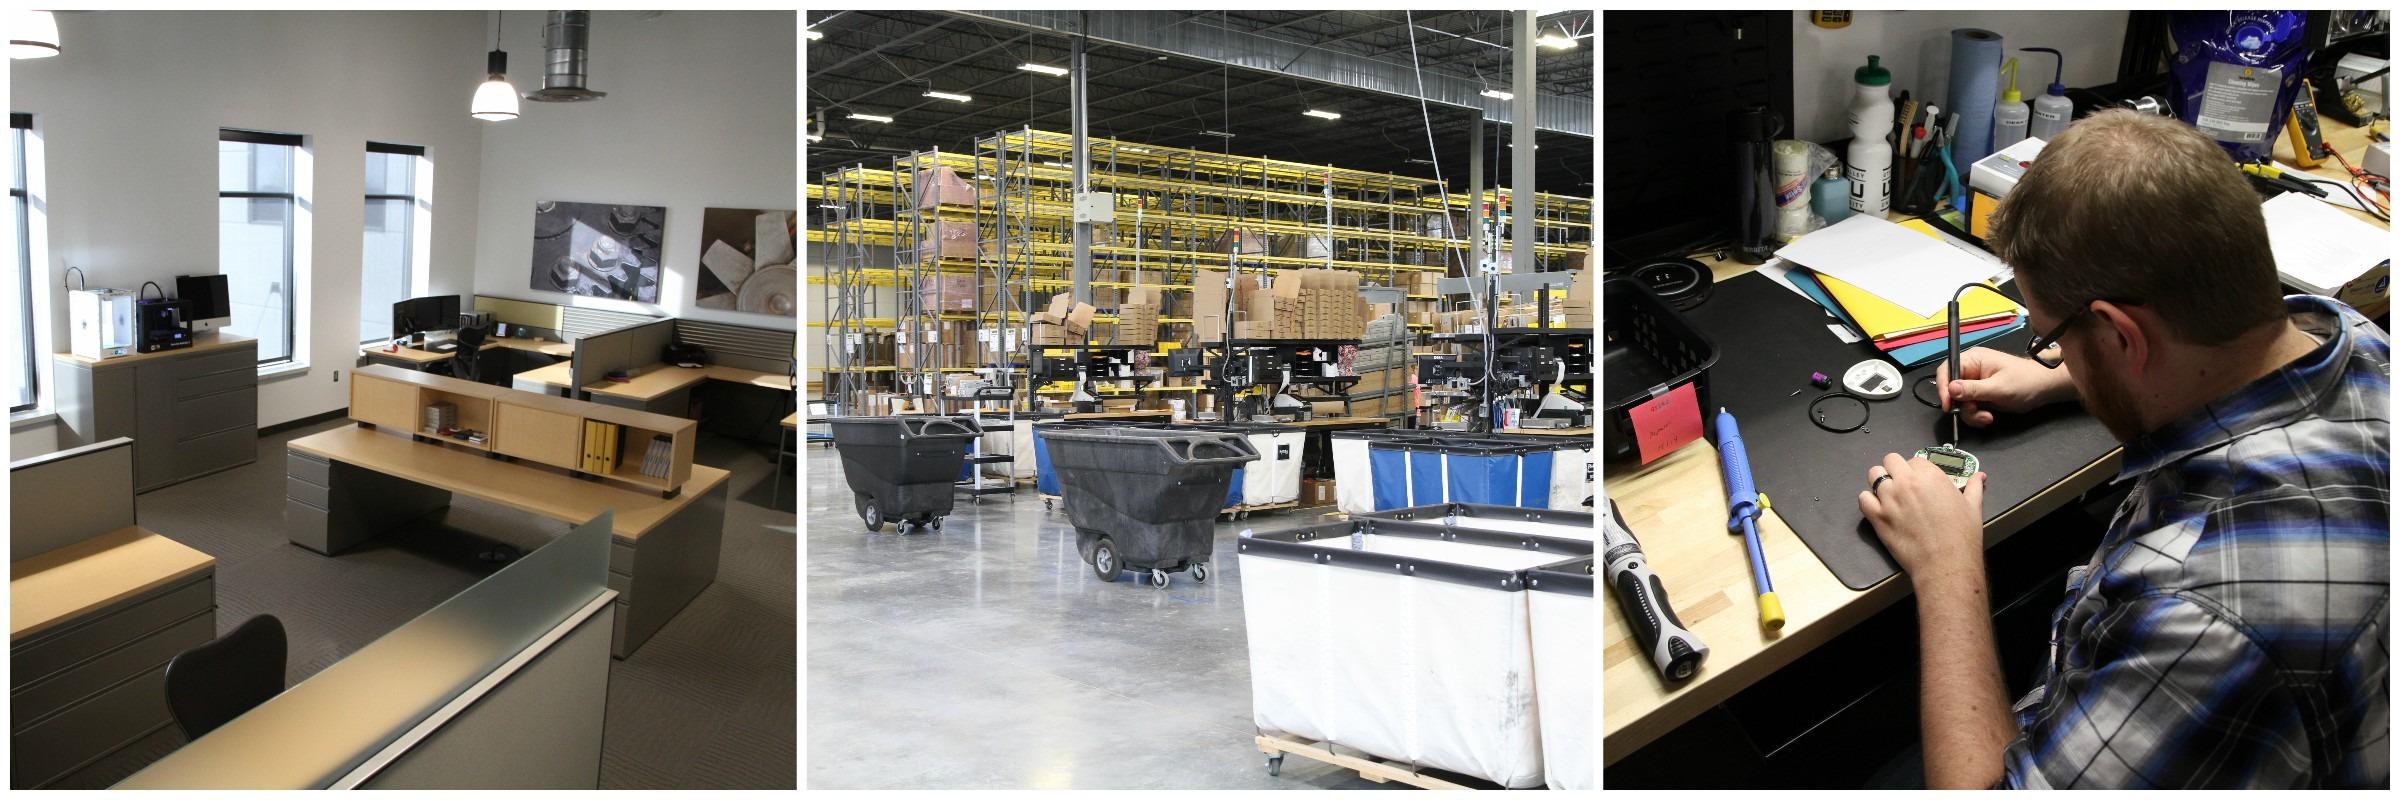 Design Studio, Warehouse, Tech Support